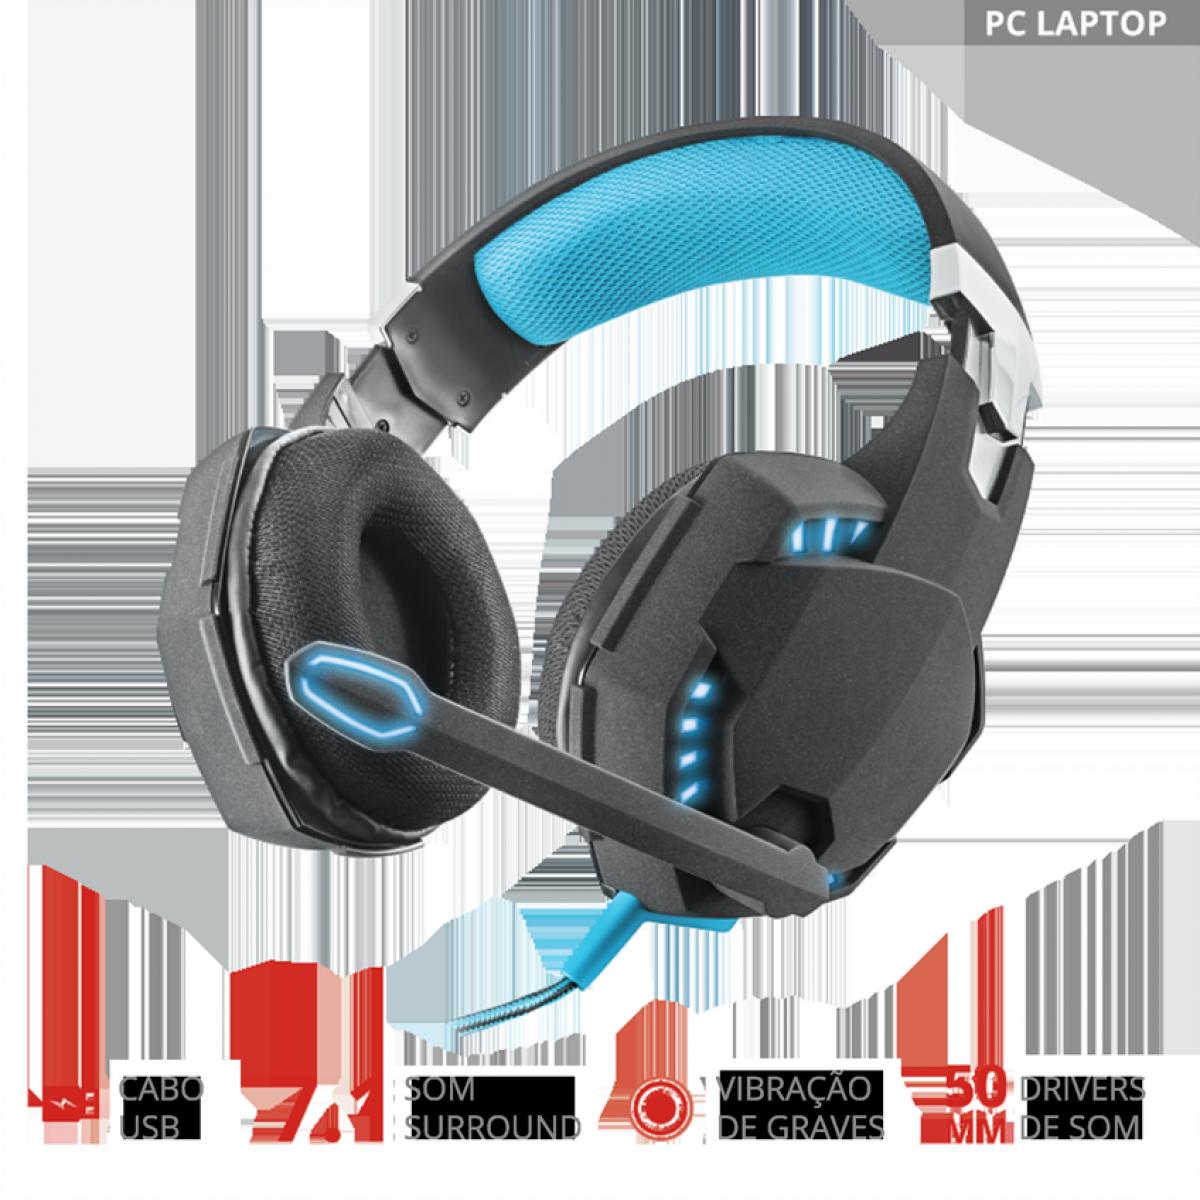 Headset GamerTrustHawk 7.1, Bass Vibration, USB, GXT363